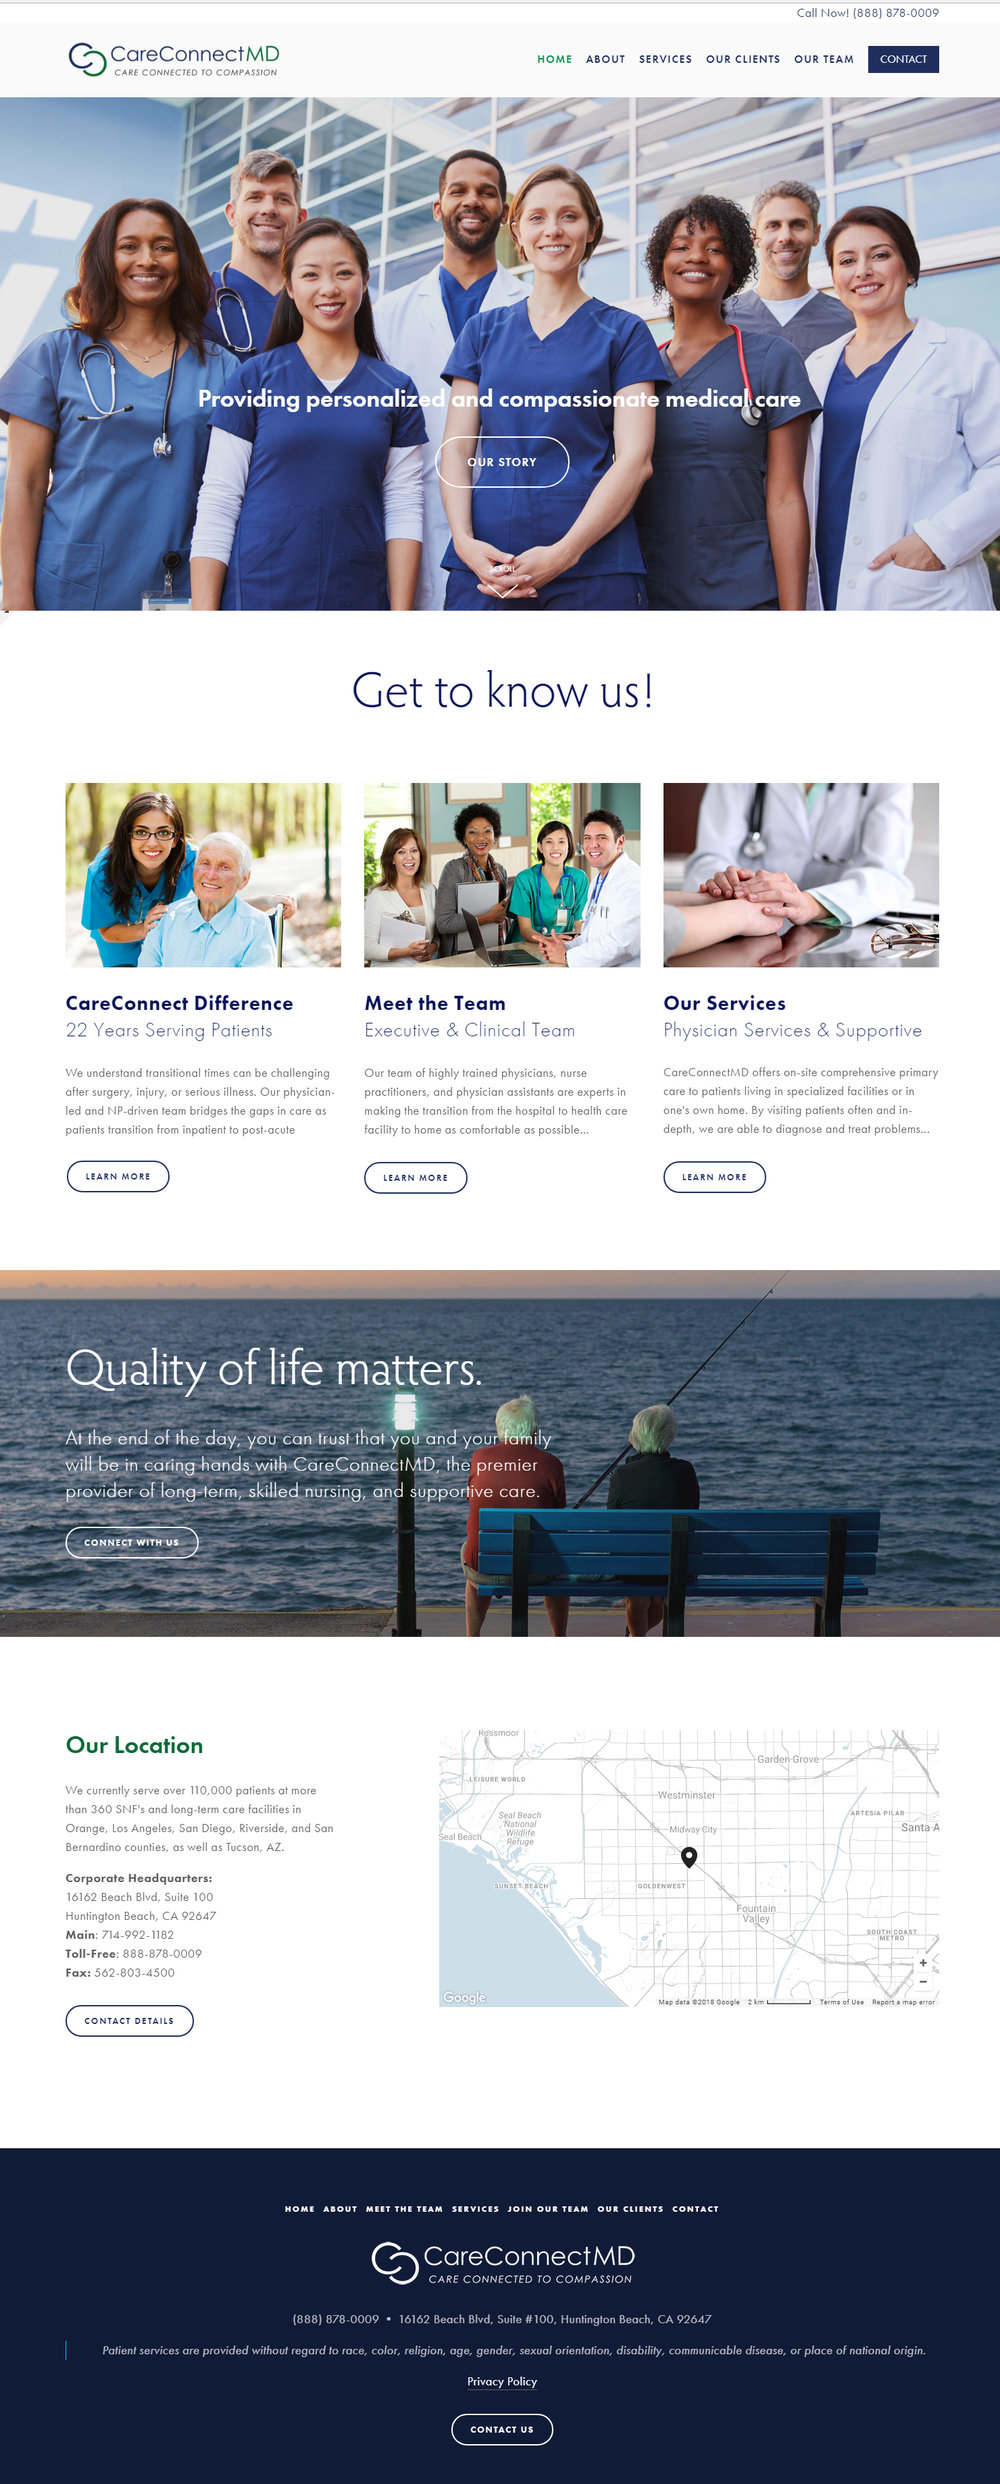 CareConnectMD - Healthcare Website